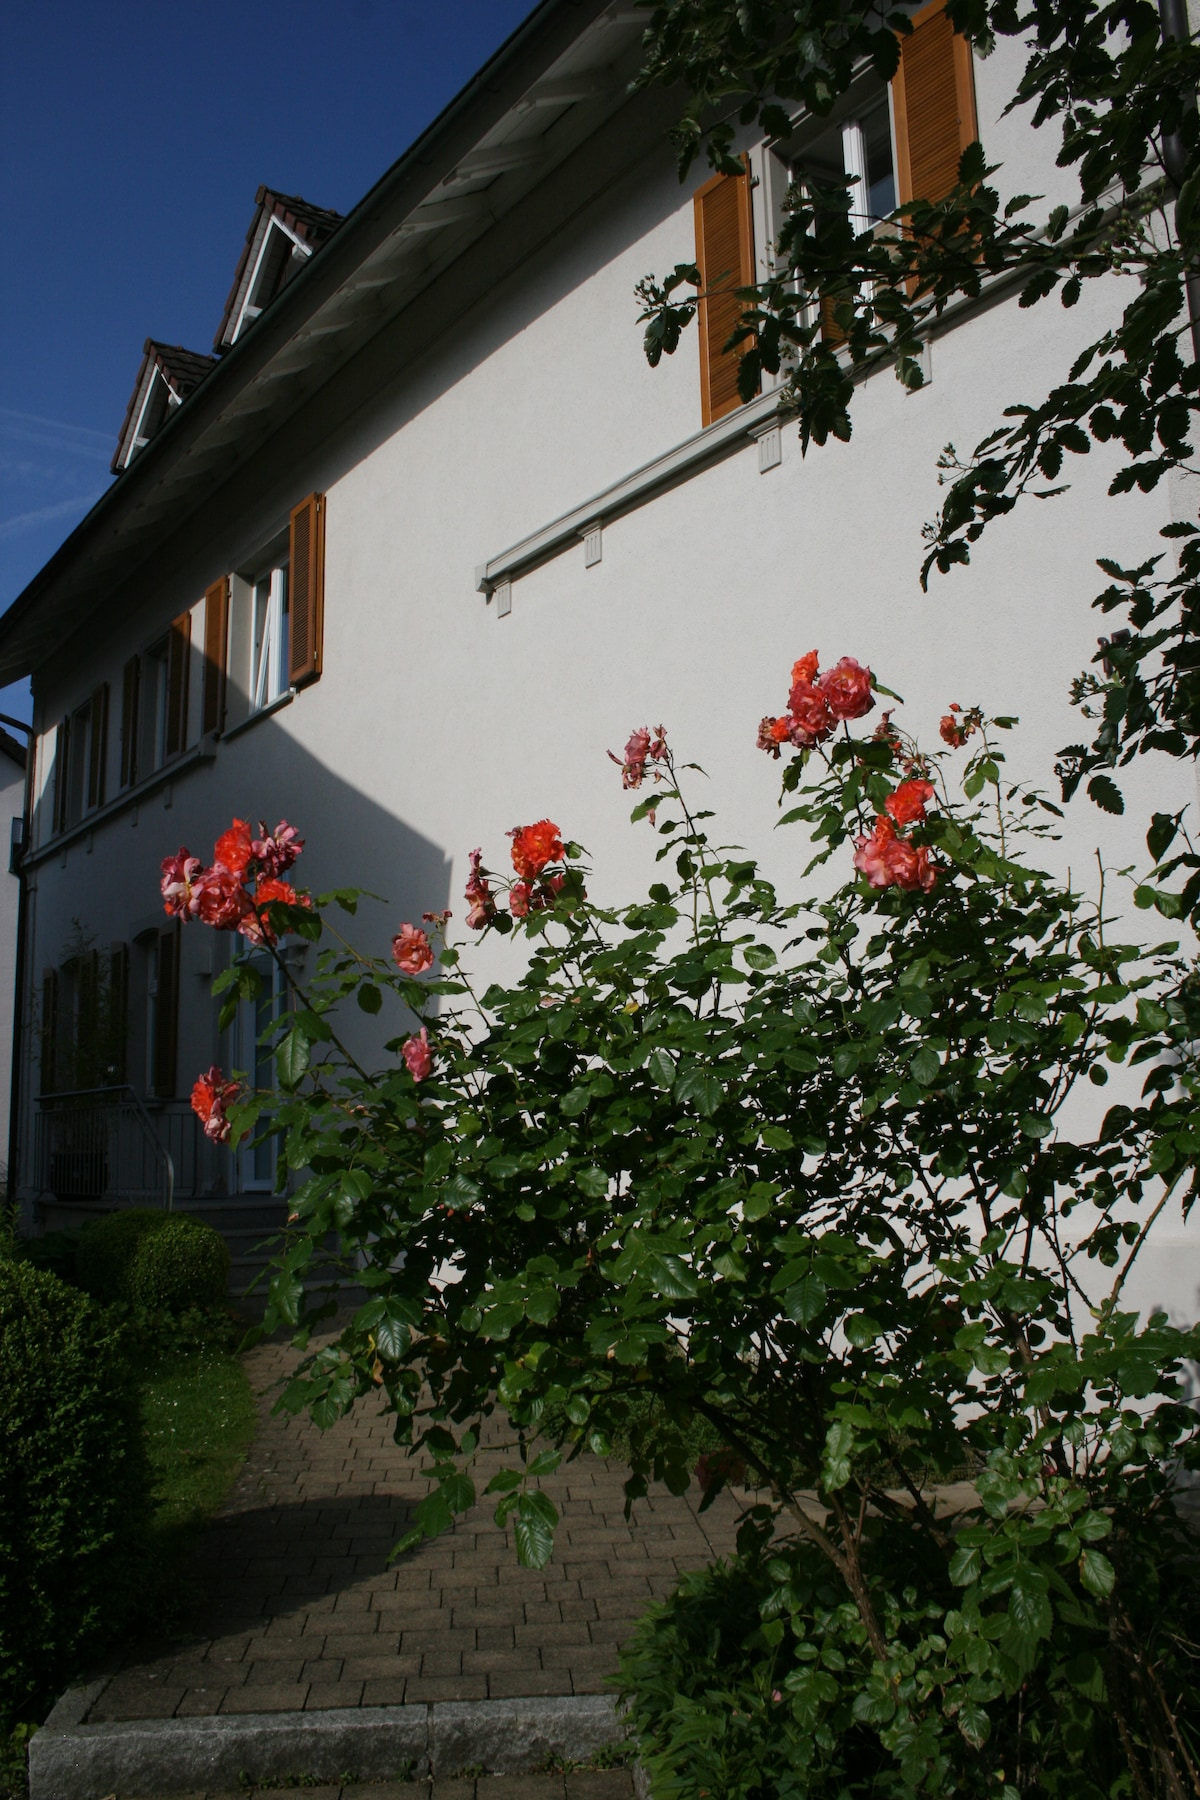 Elke Anna da Radolfzell